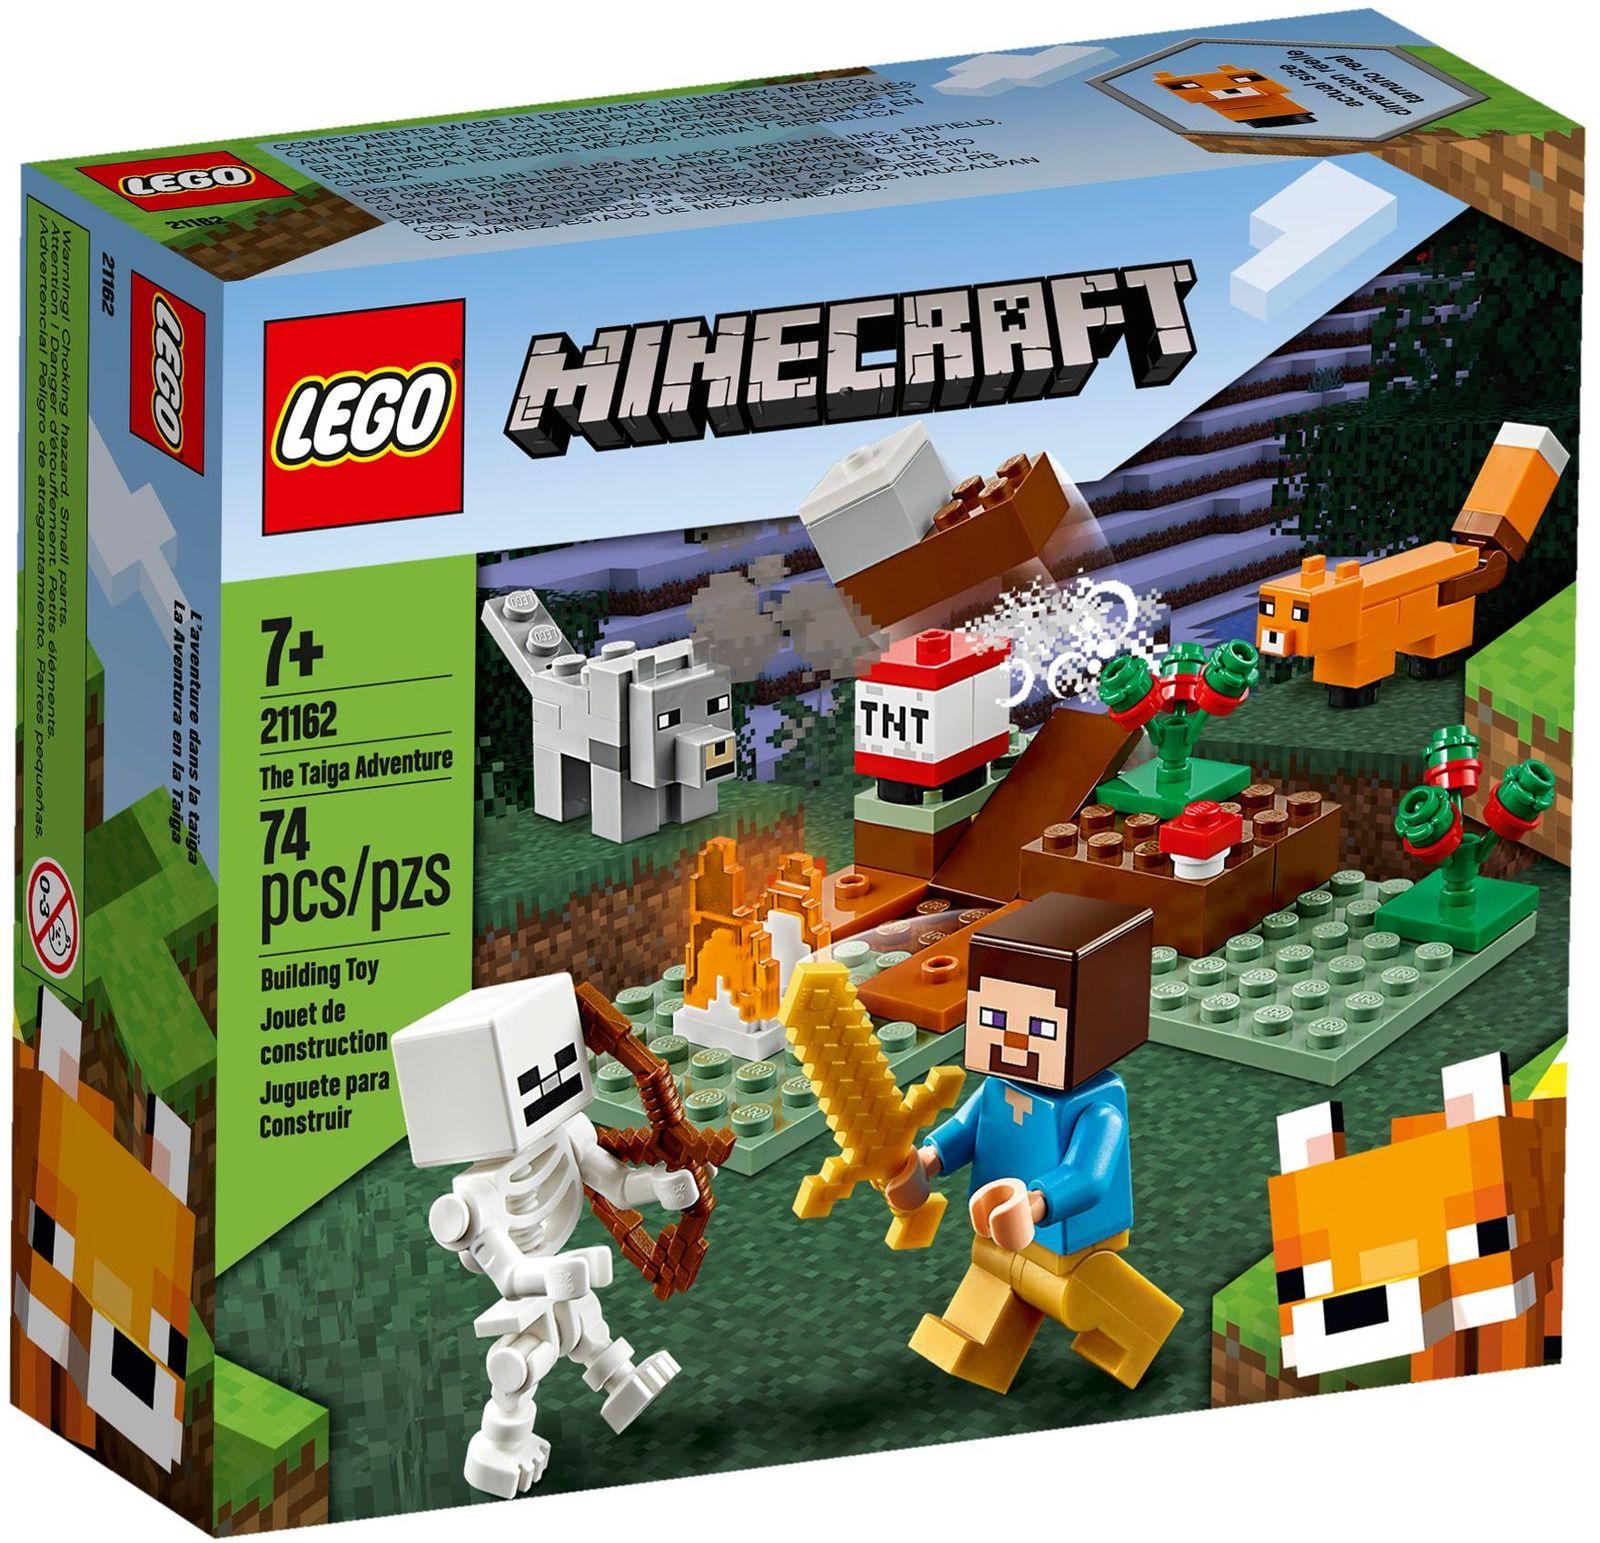 LEGO Minecraft: The Taiga Adventure - (21162) image